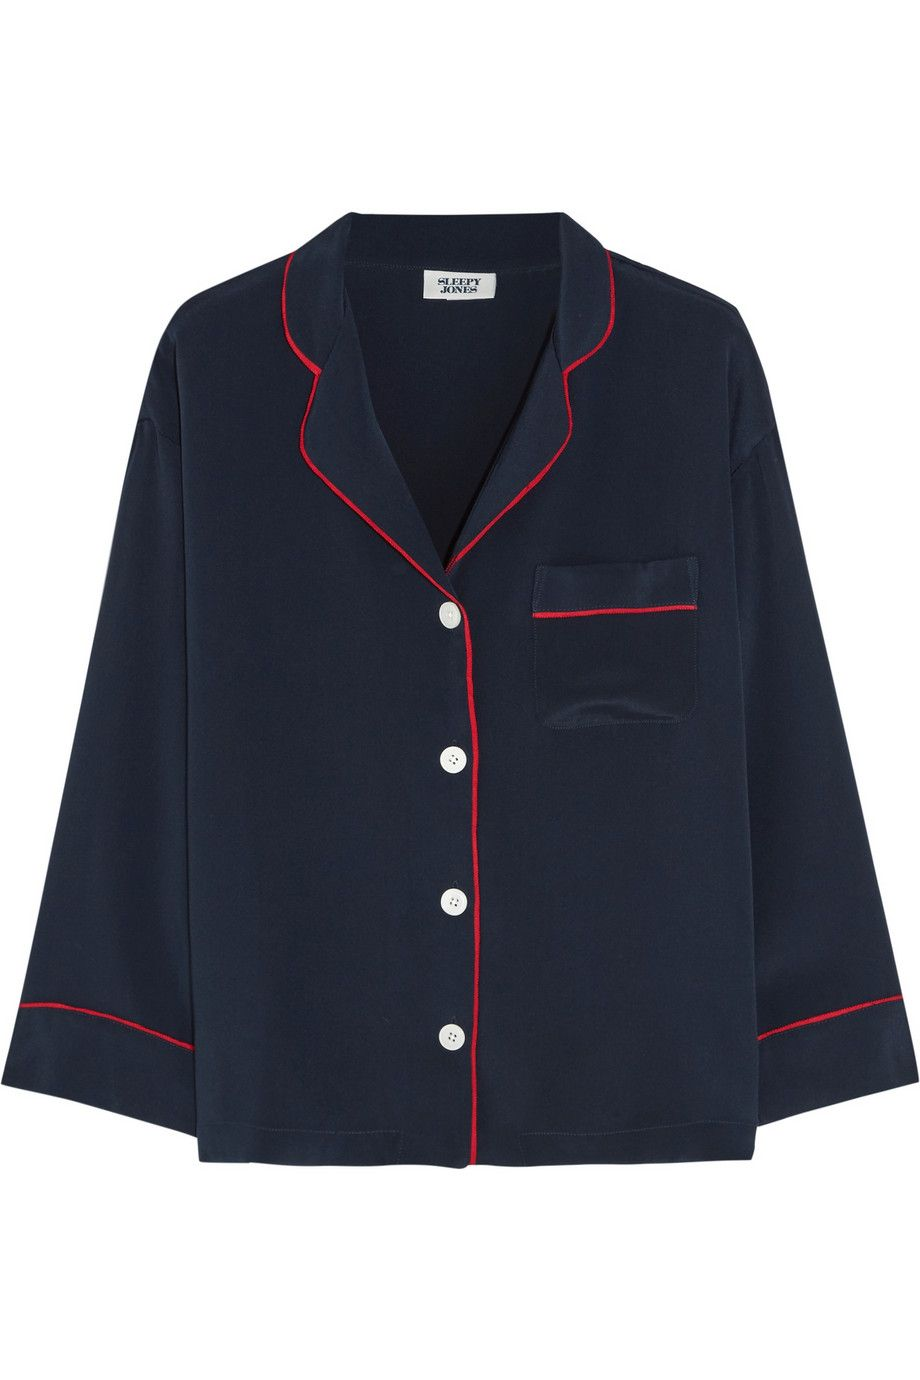 Big Sale For Sale Buy Cheap 100% Original Sleepy Jones Woman Printed Silk-satin Pajama Top Navy Size L Sleepy Jones 1gsdwSnTy